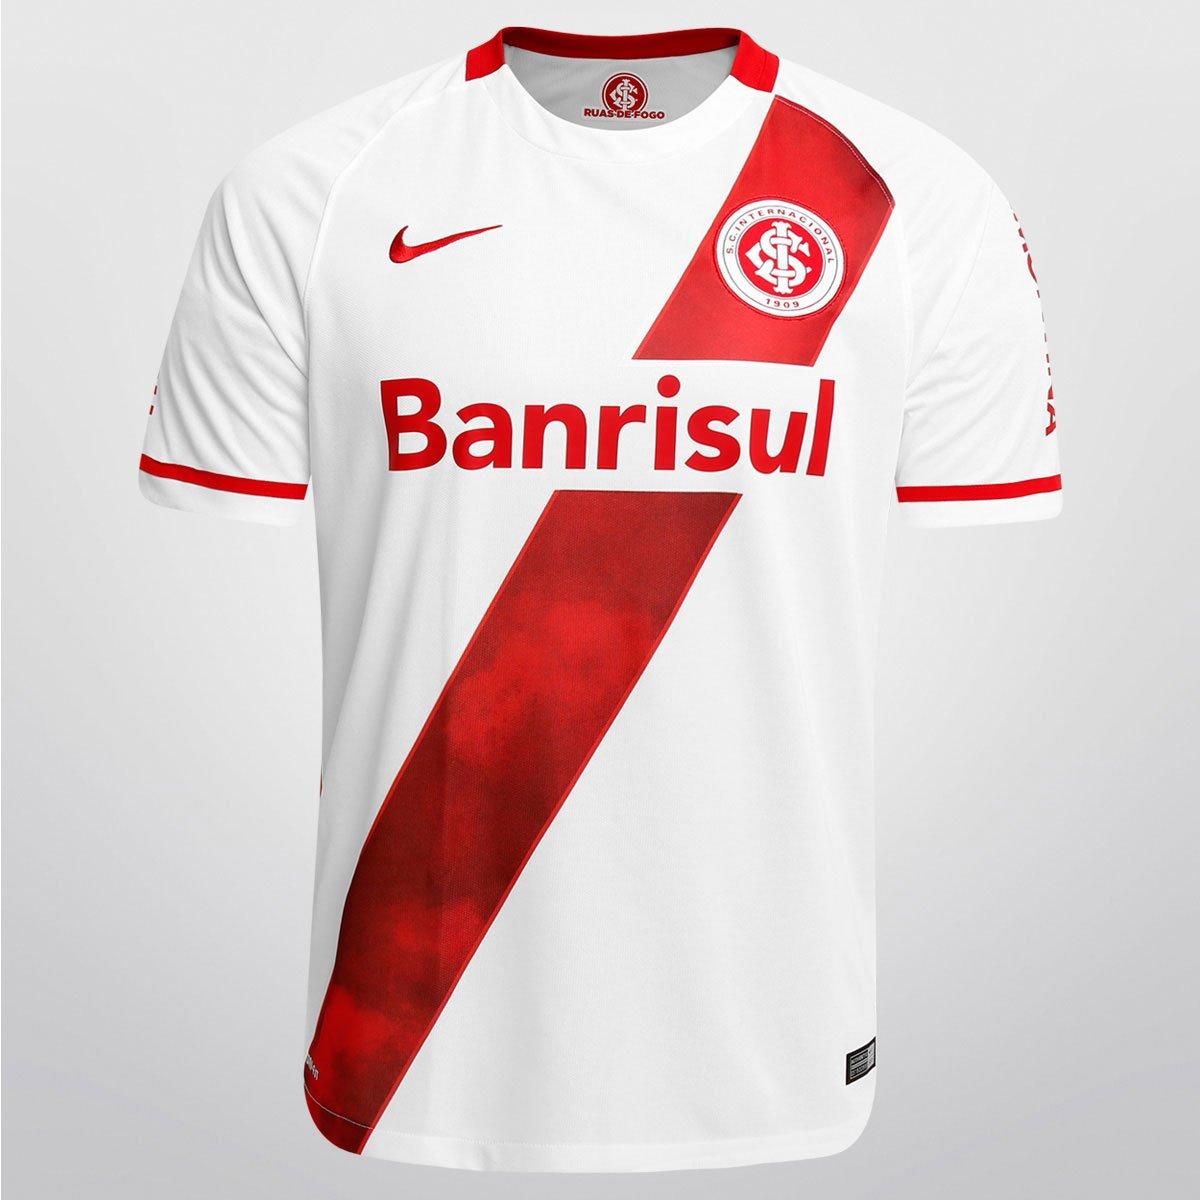 Camisa Nike Internacional II 15 16 s nº - Compre Agora  85727b2a624a9